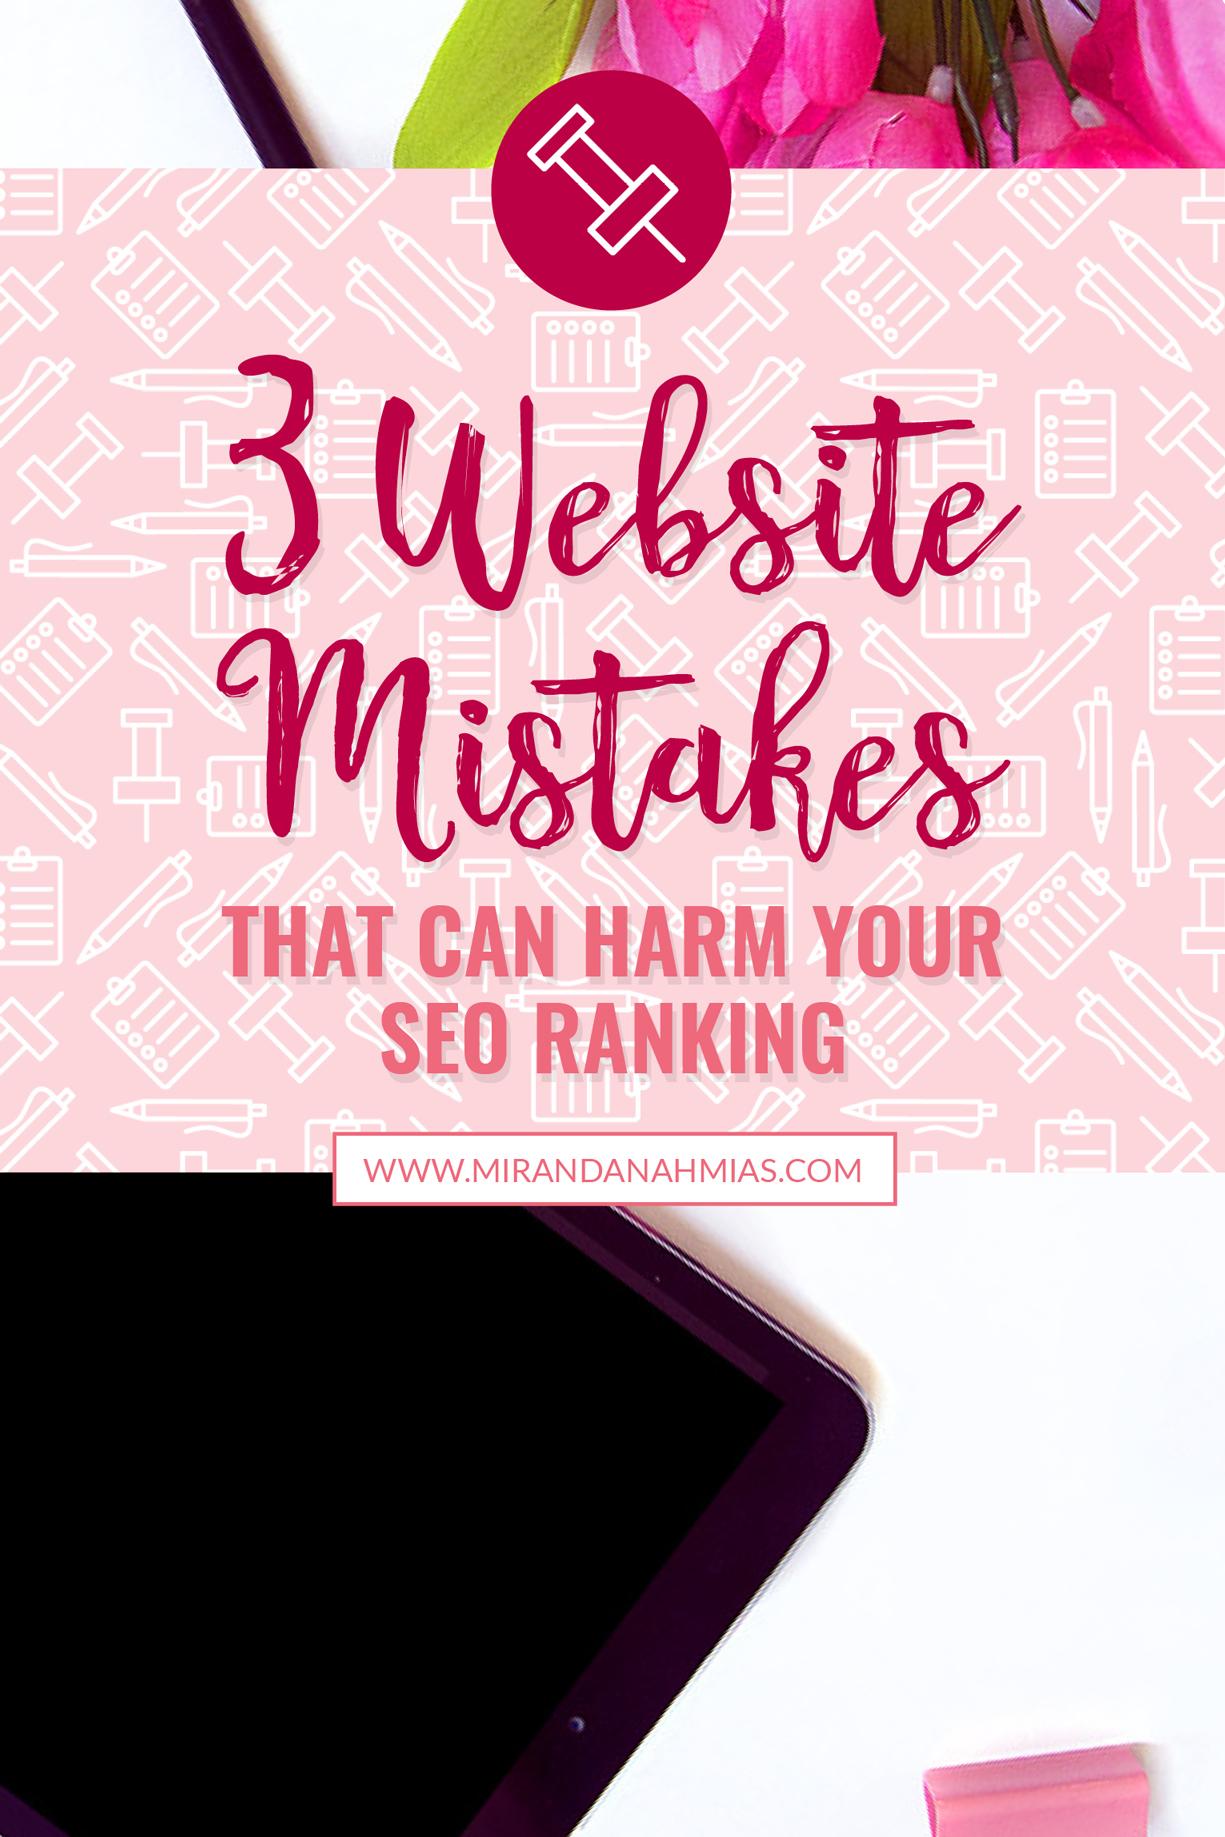 Your-SEO-Ranking-Pinterest-3